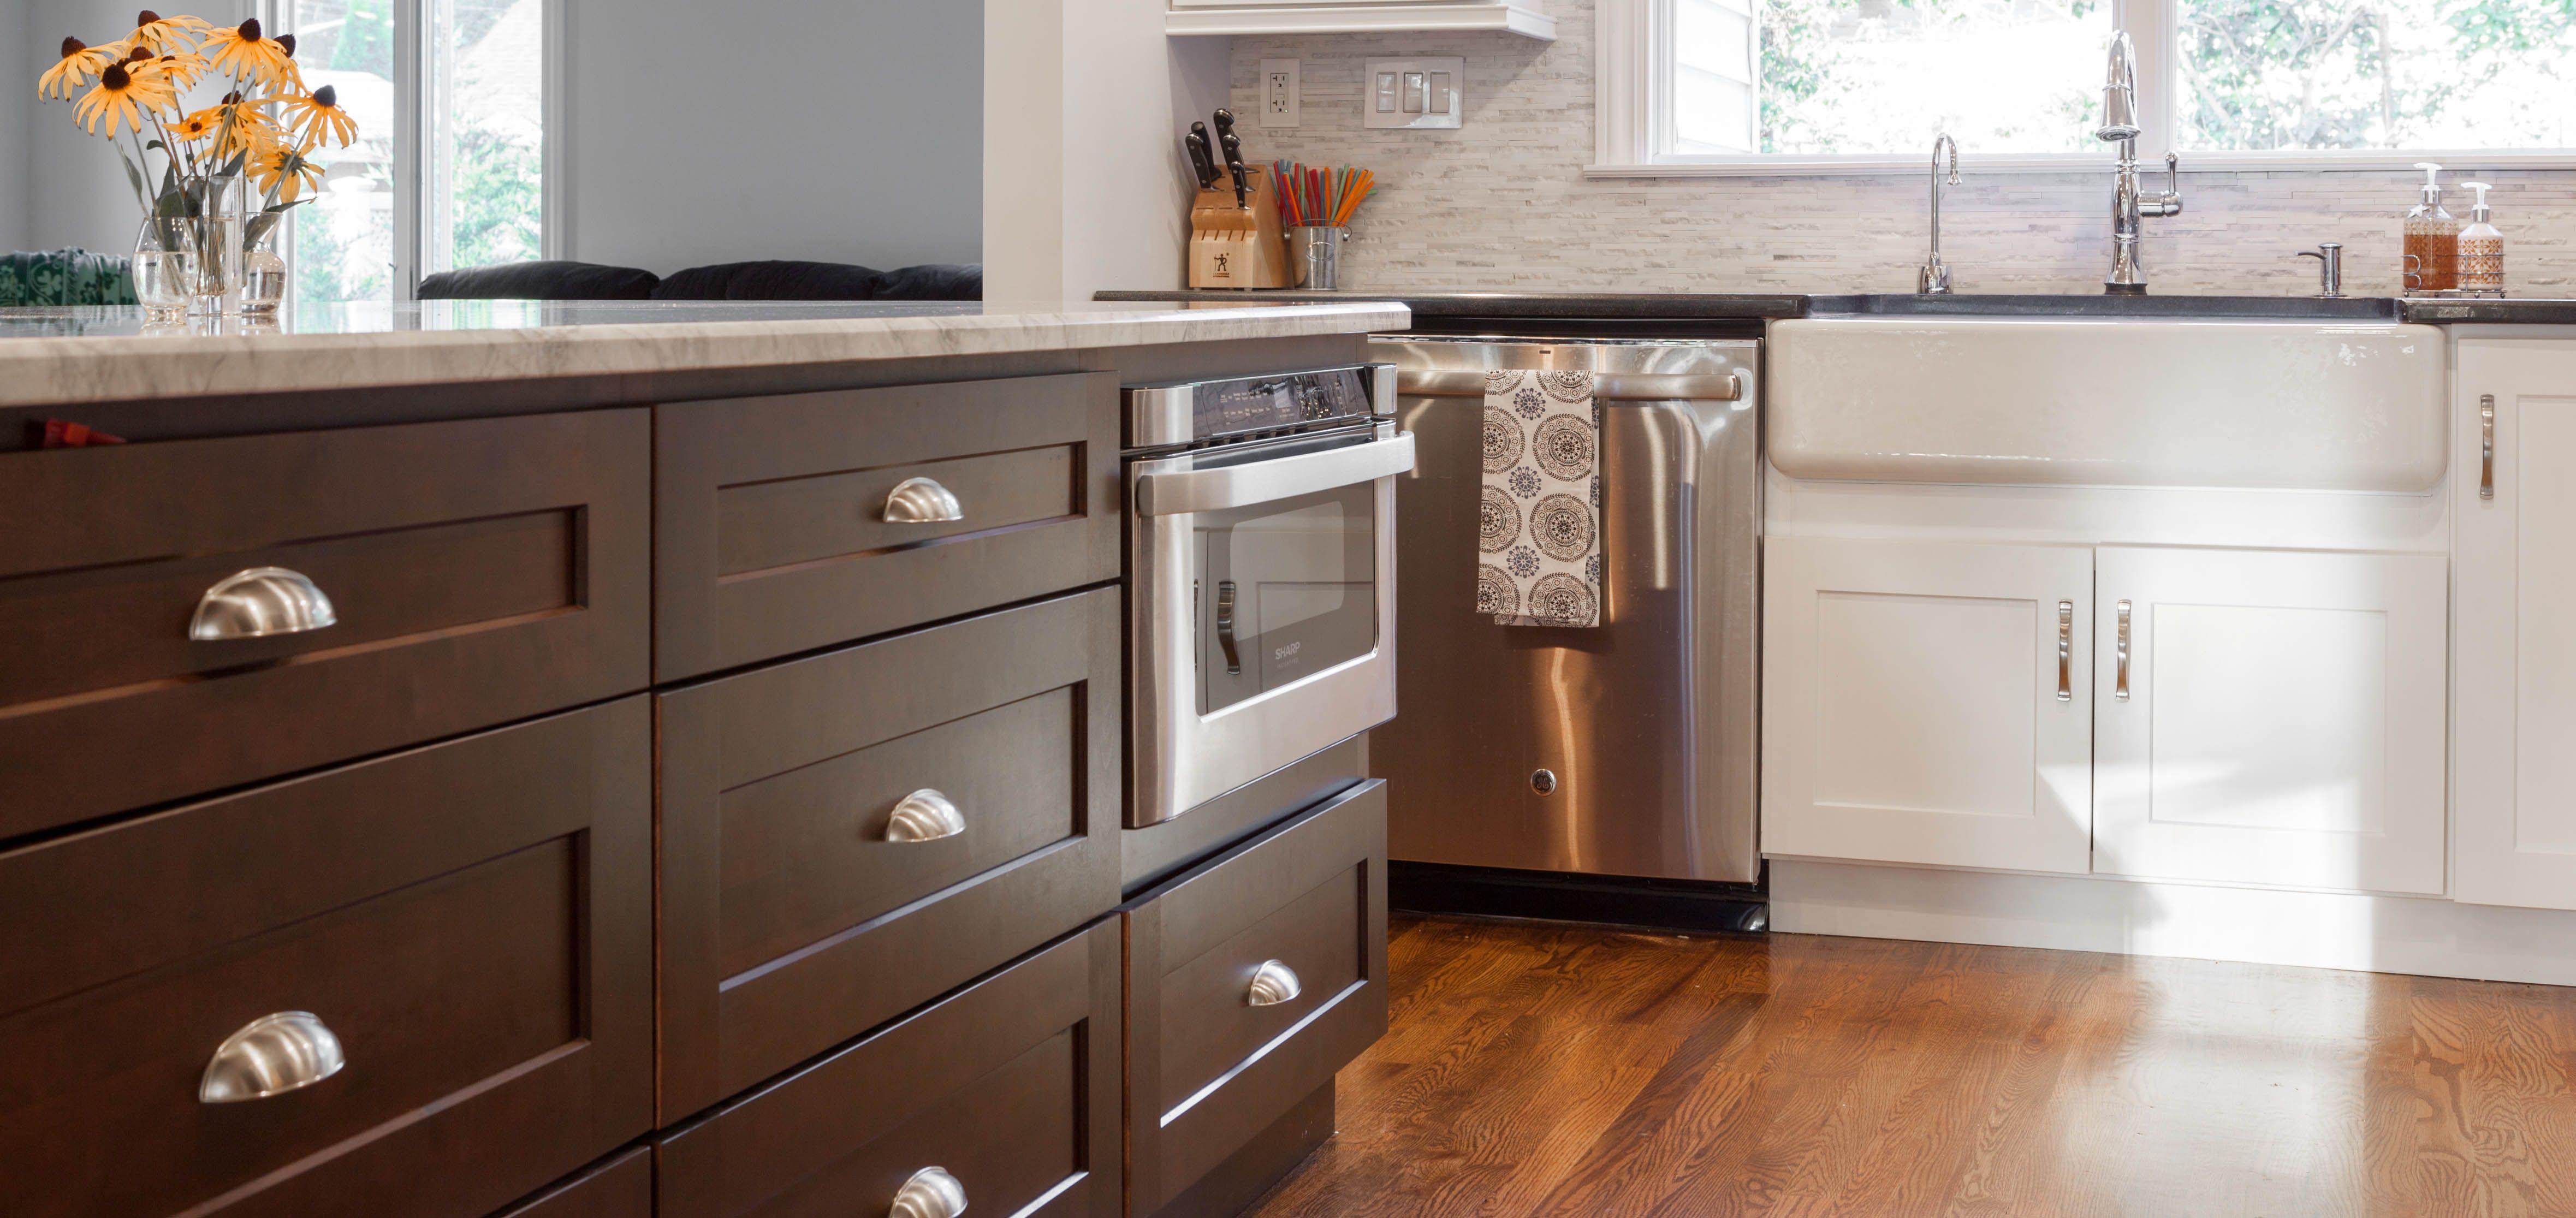 J K Modern Cabinets In Java Coffee Finish Style S1 Kitchen Cabinets Wood Kitchen Cabinets Solid Wood Kitchen Cabinets